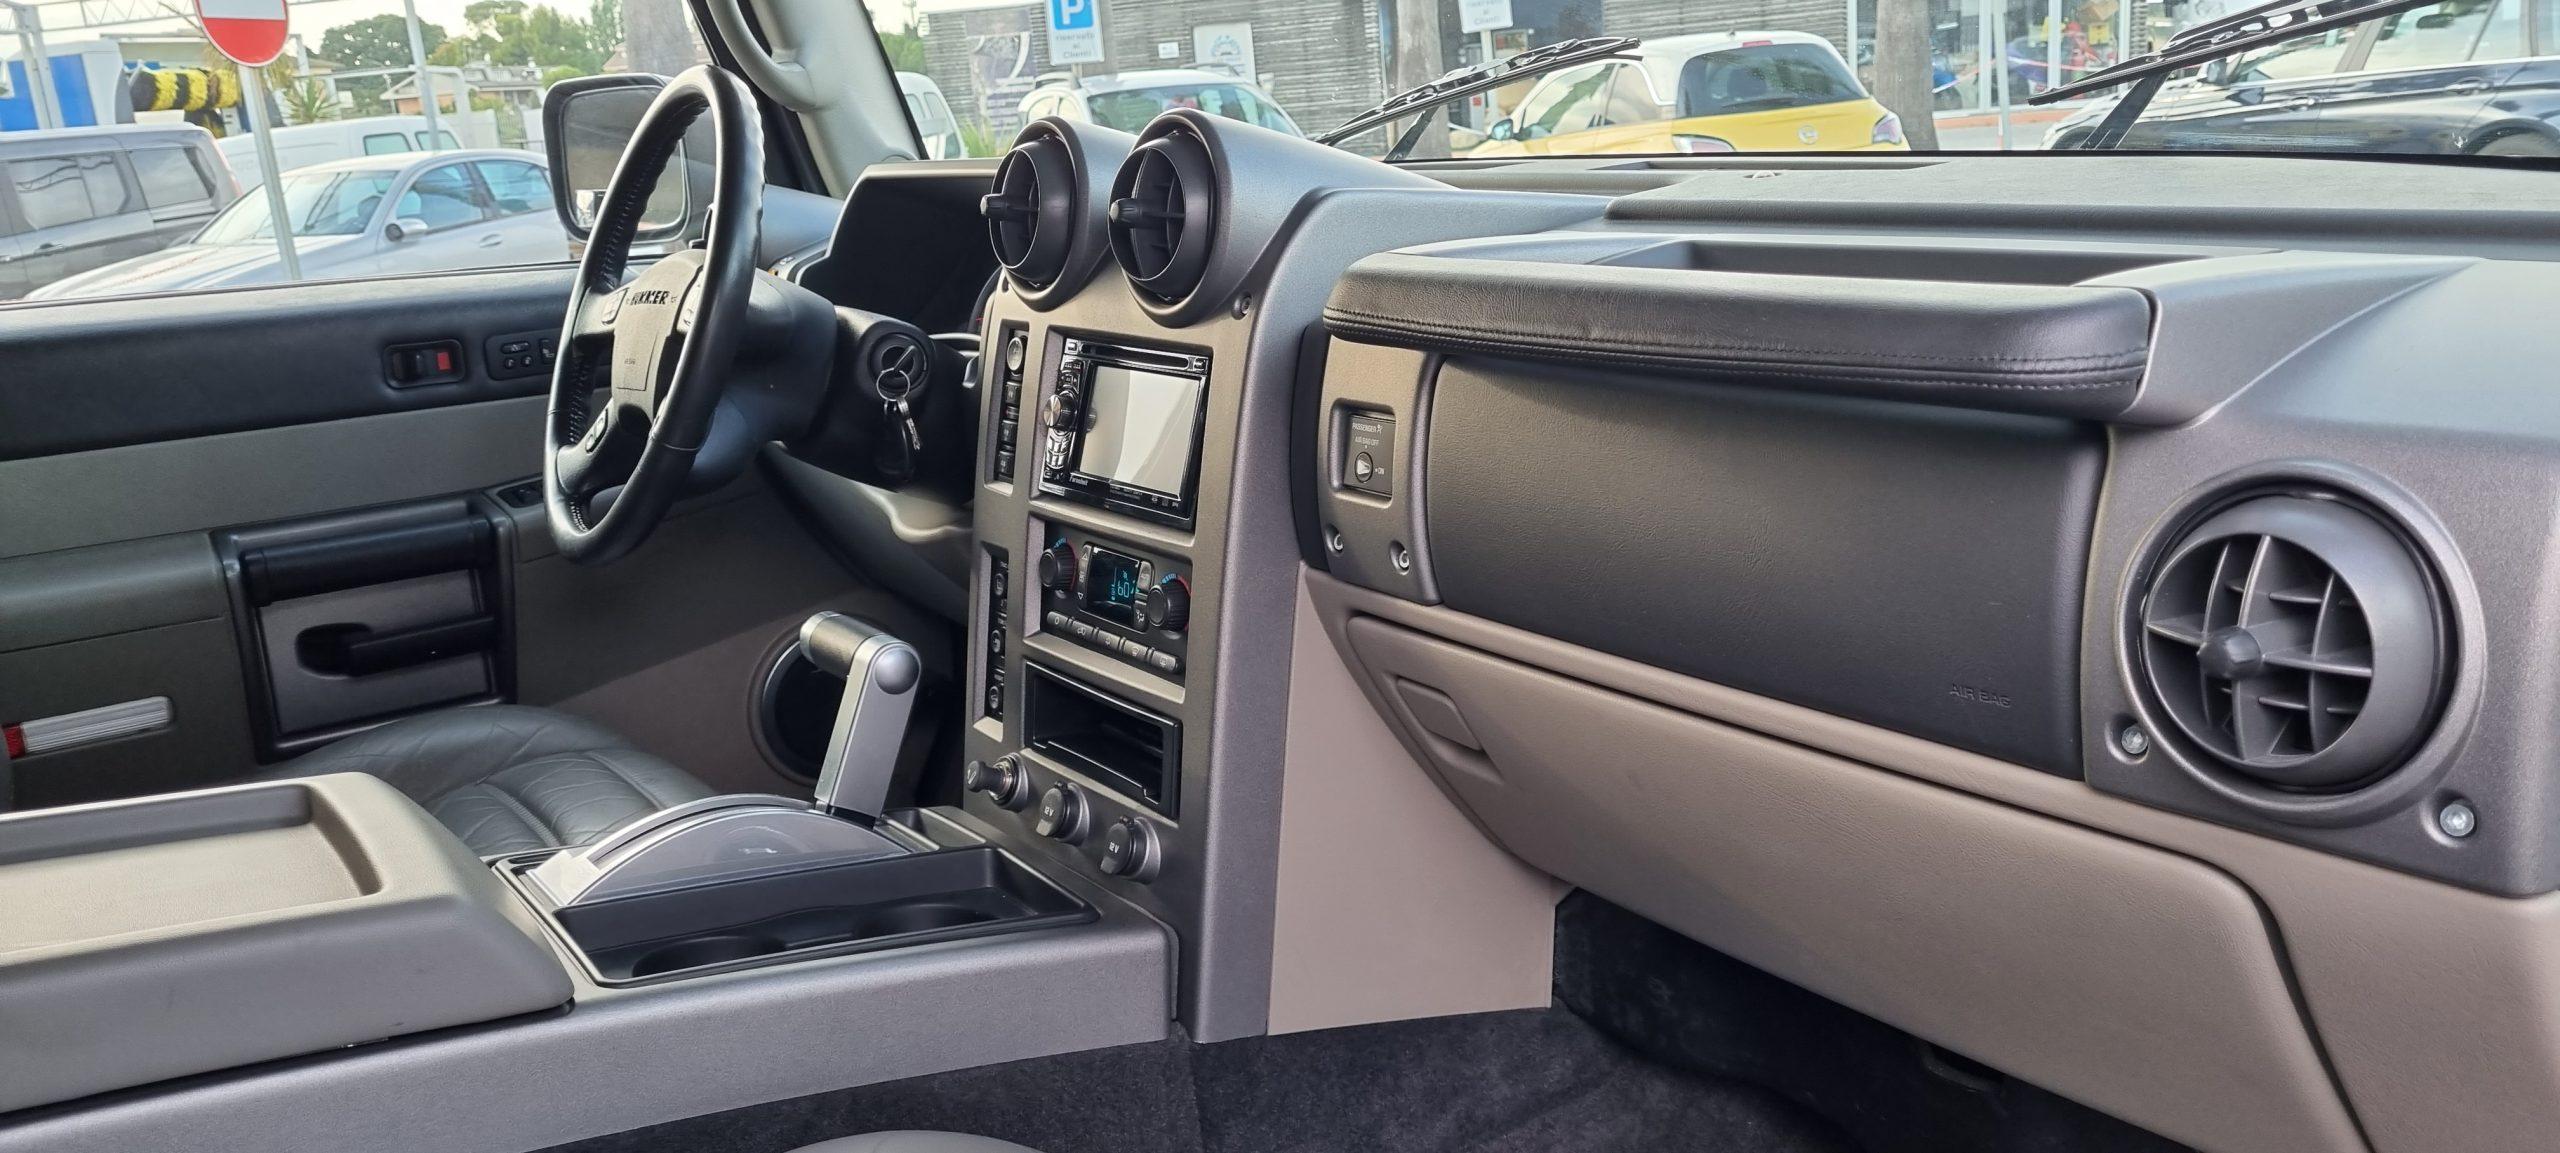 HAMMER H2 6.0 V8 Luxury